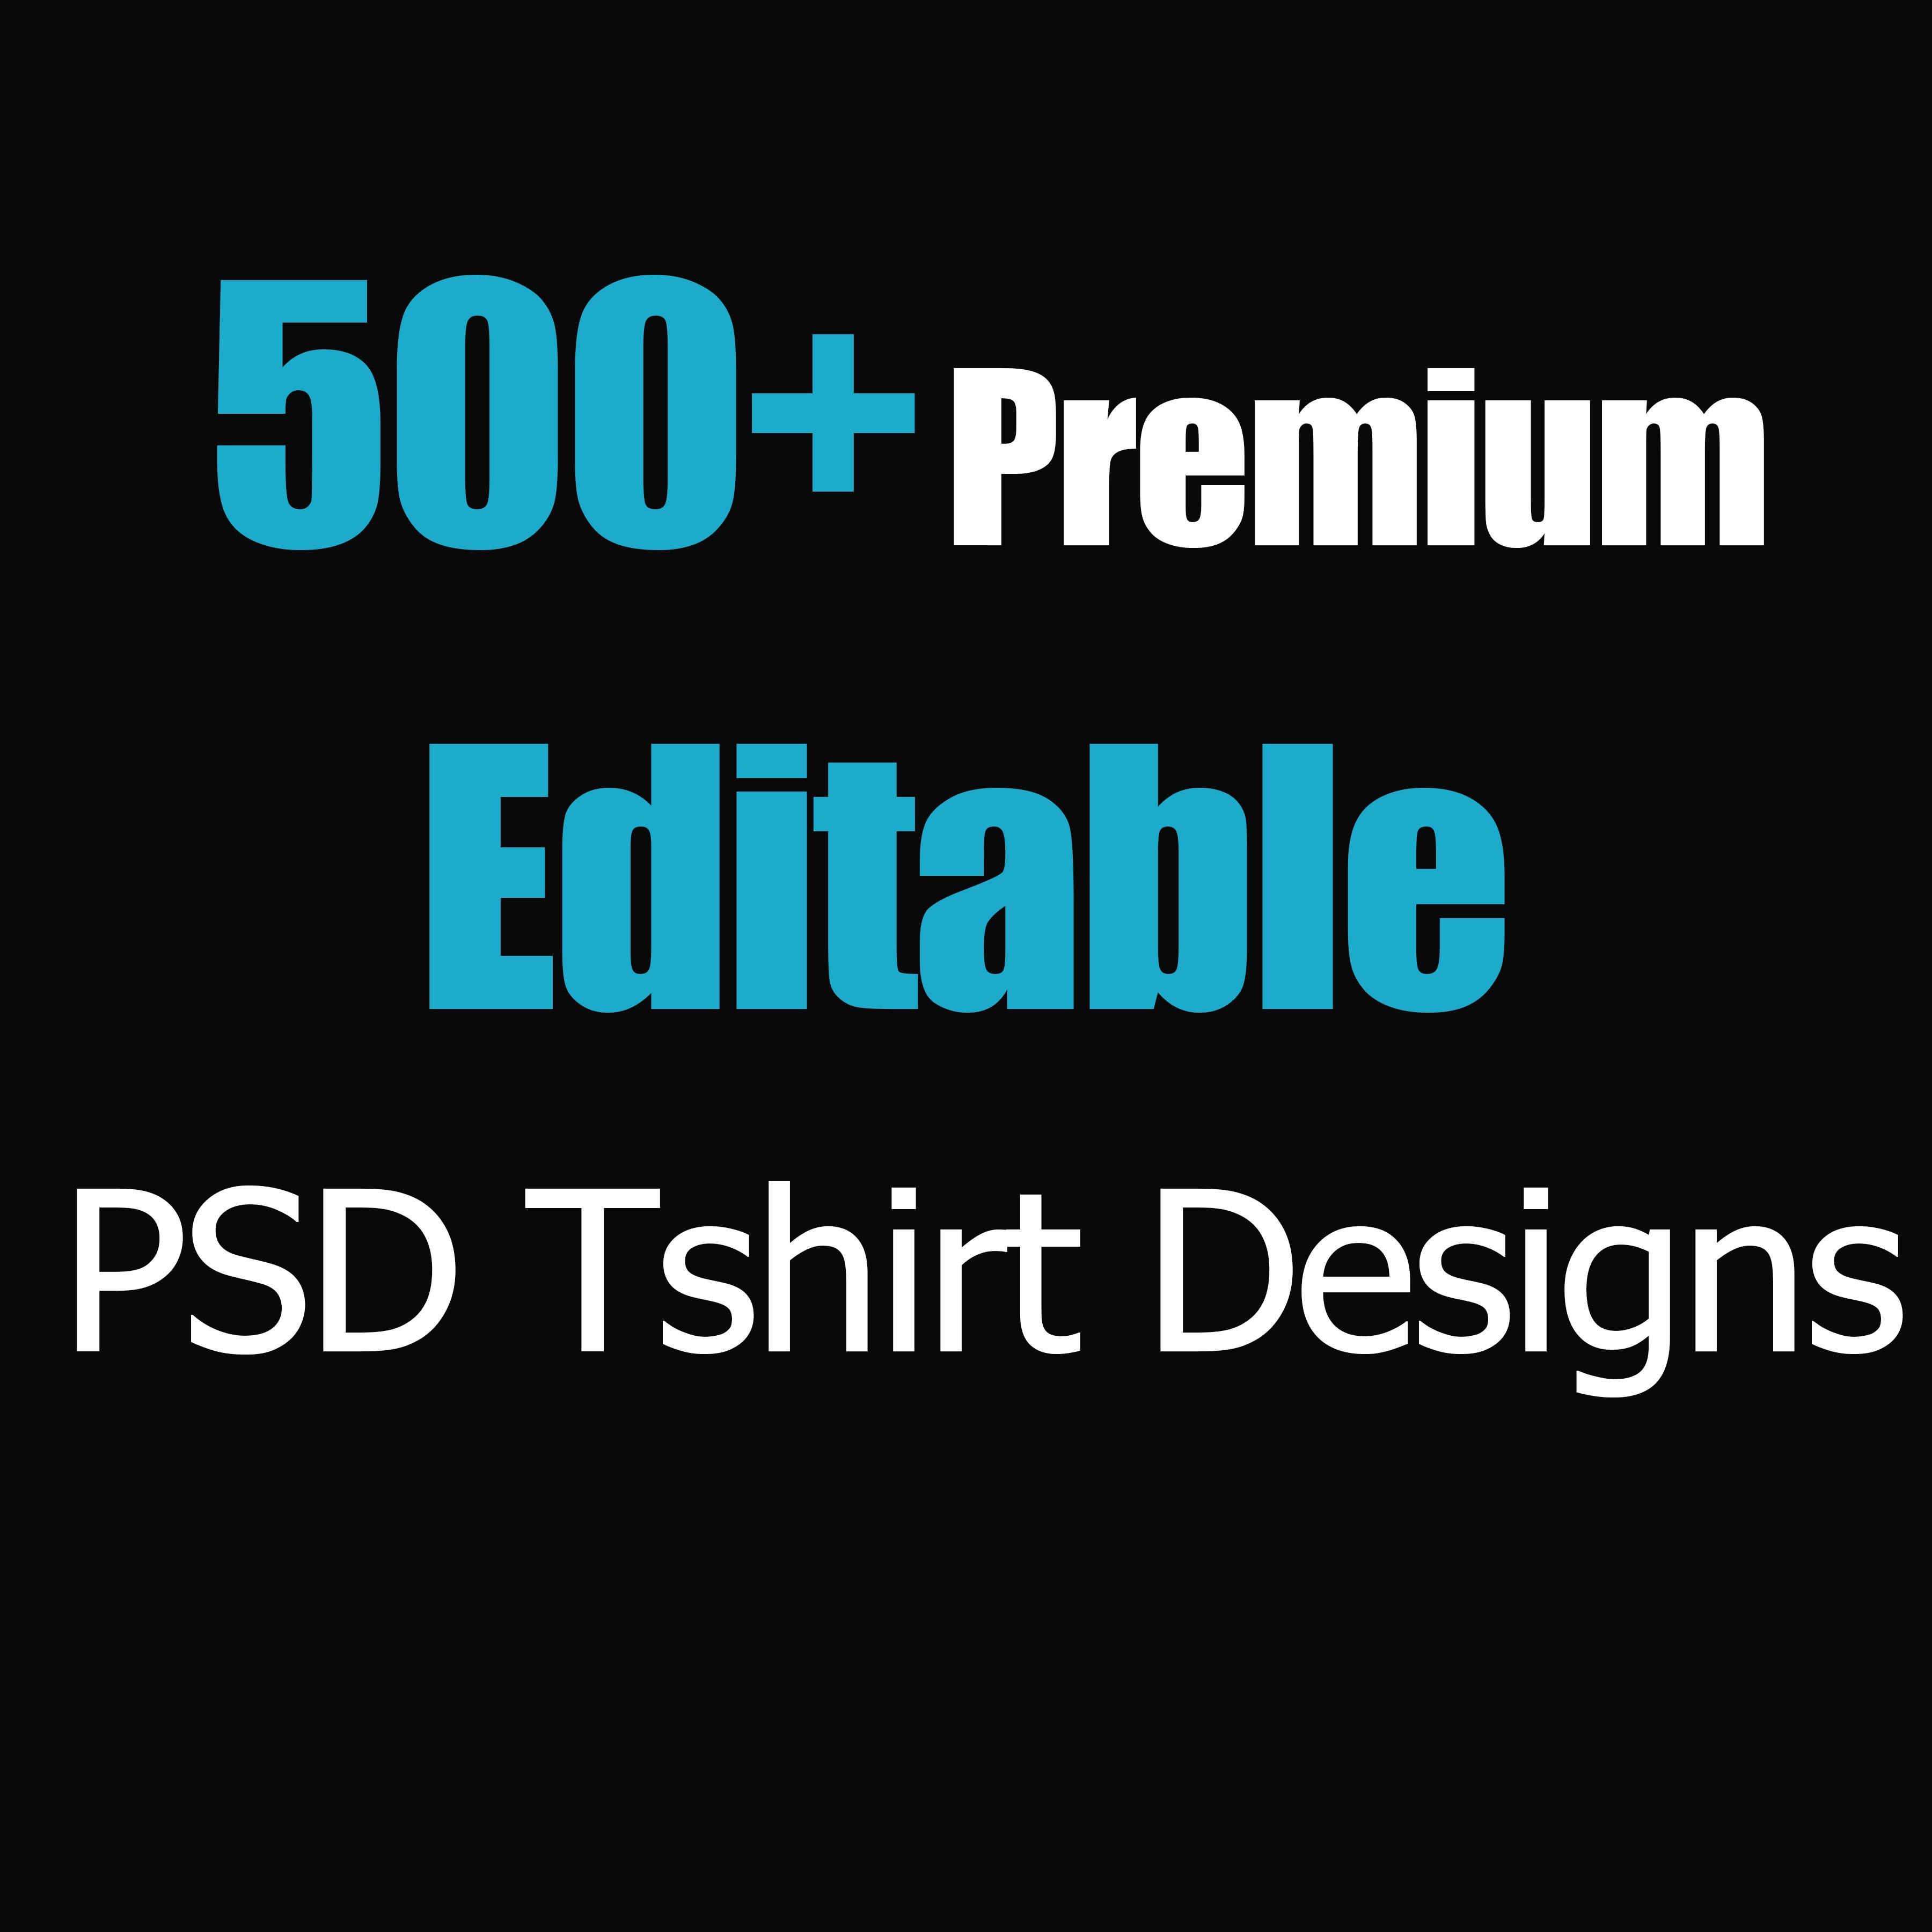 500+ Premium Editable PSD T-Shirt Designs